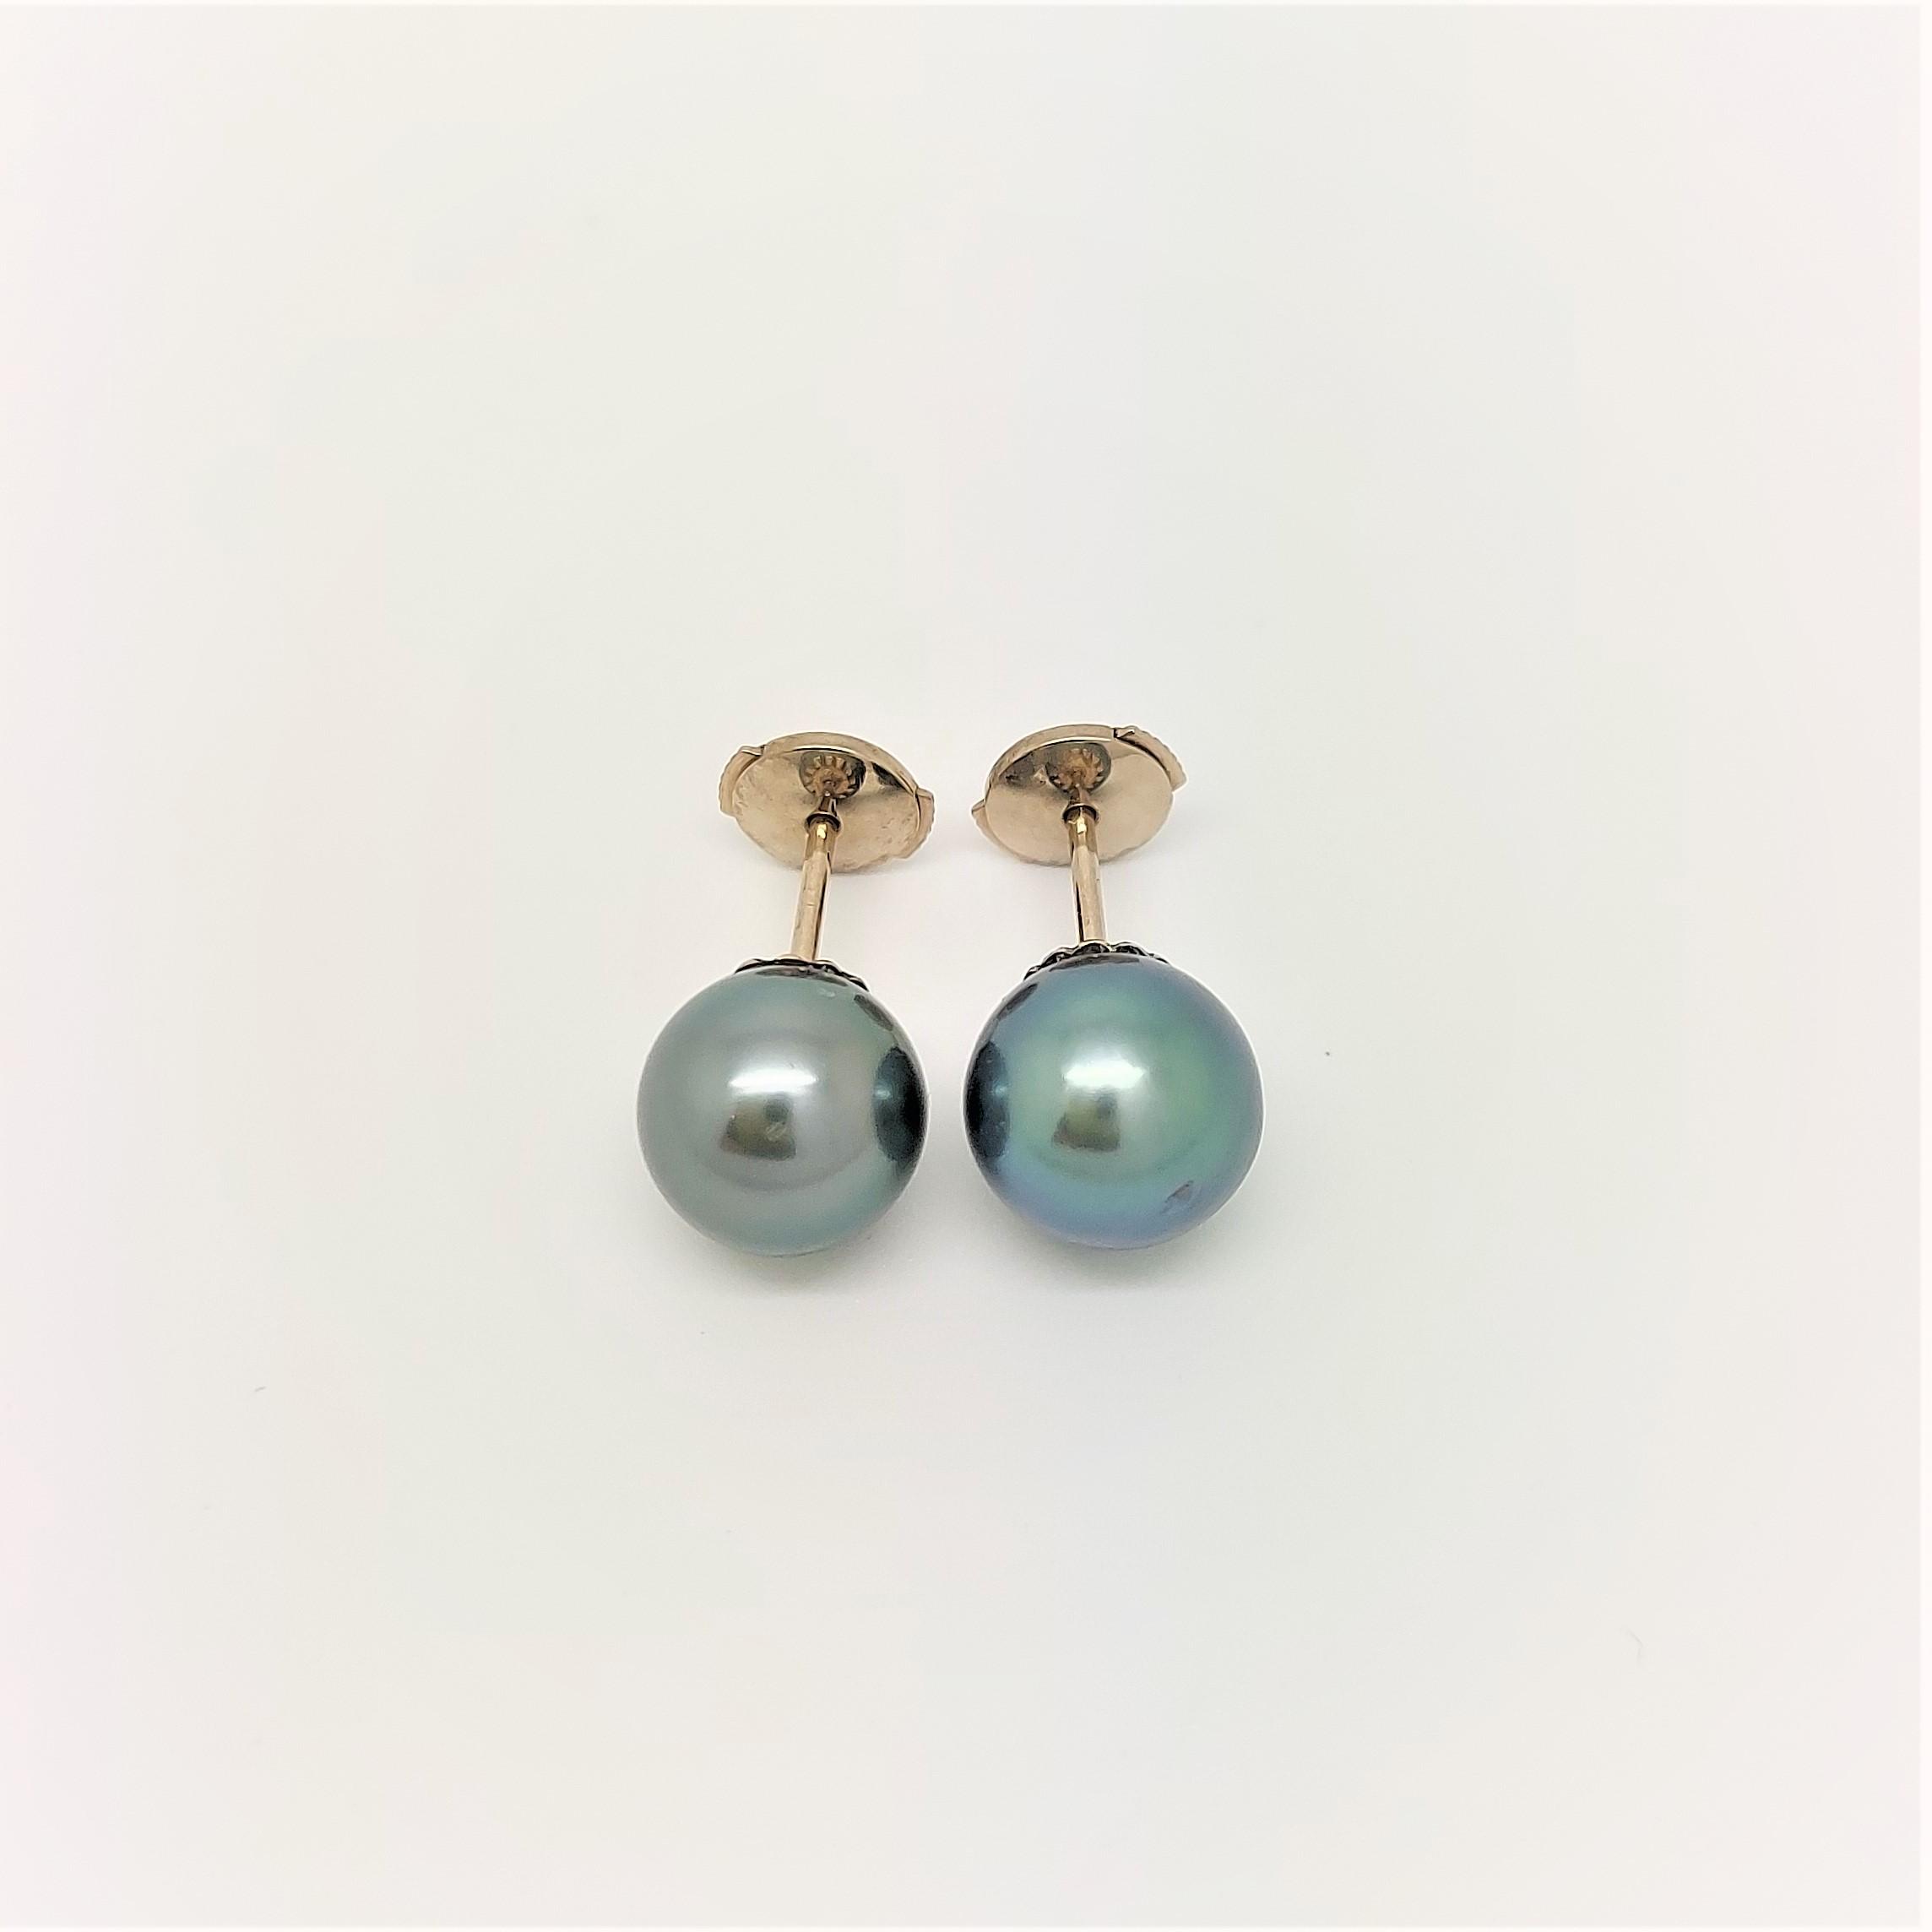 Boutons d\'oreilles 2 perles de Tahiti de 8 mm couleur bleu océan